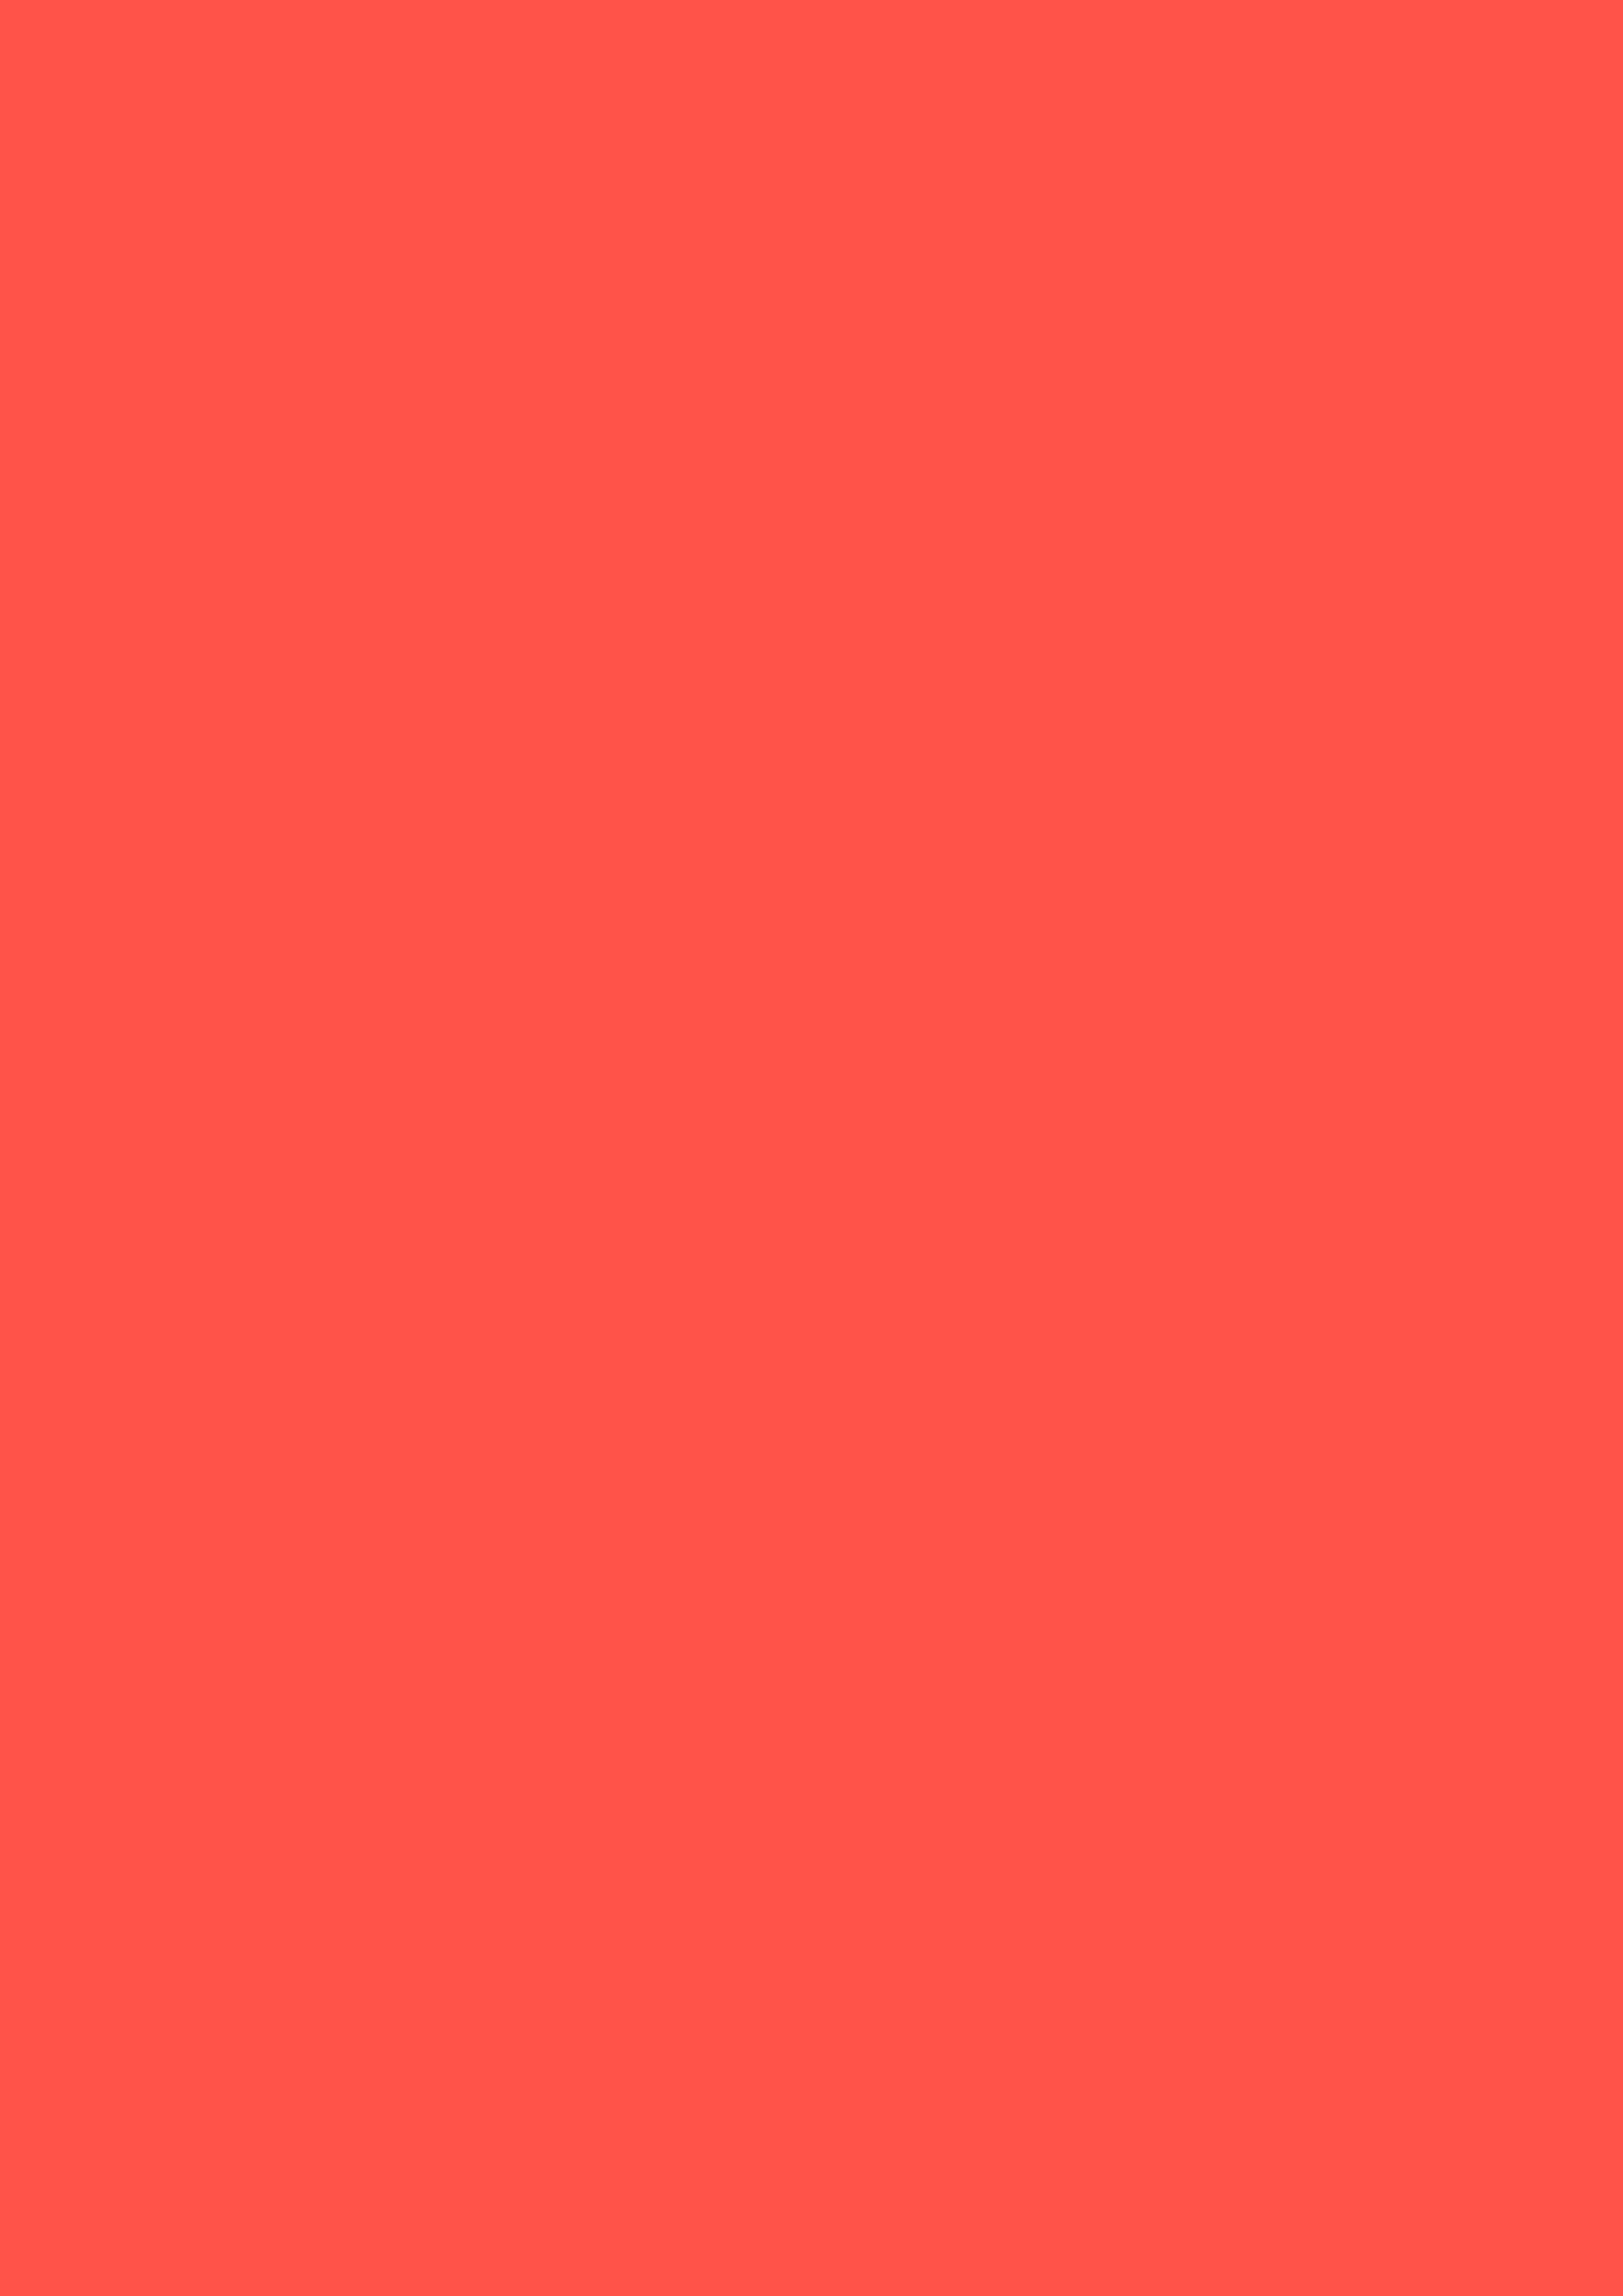 2480x3508 Red-orange Solid Color Background